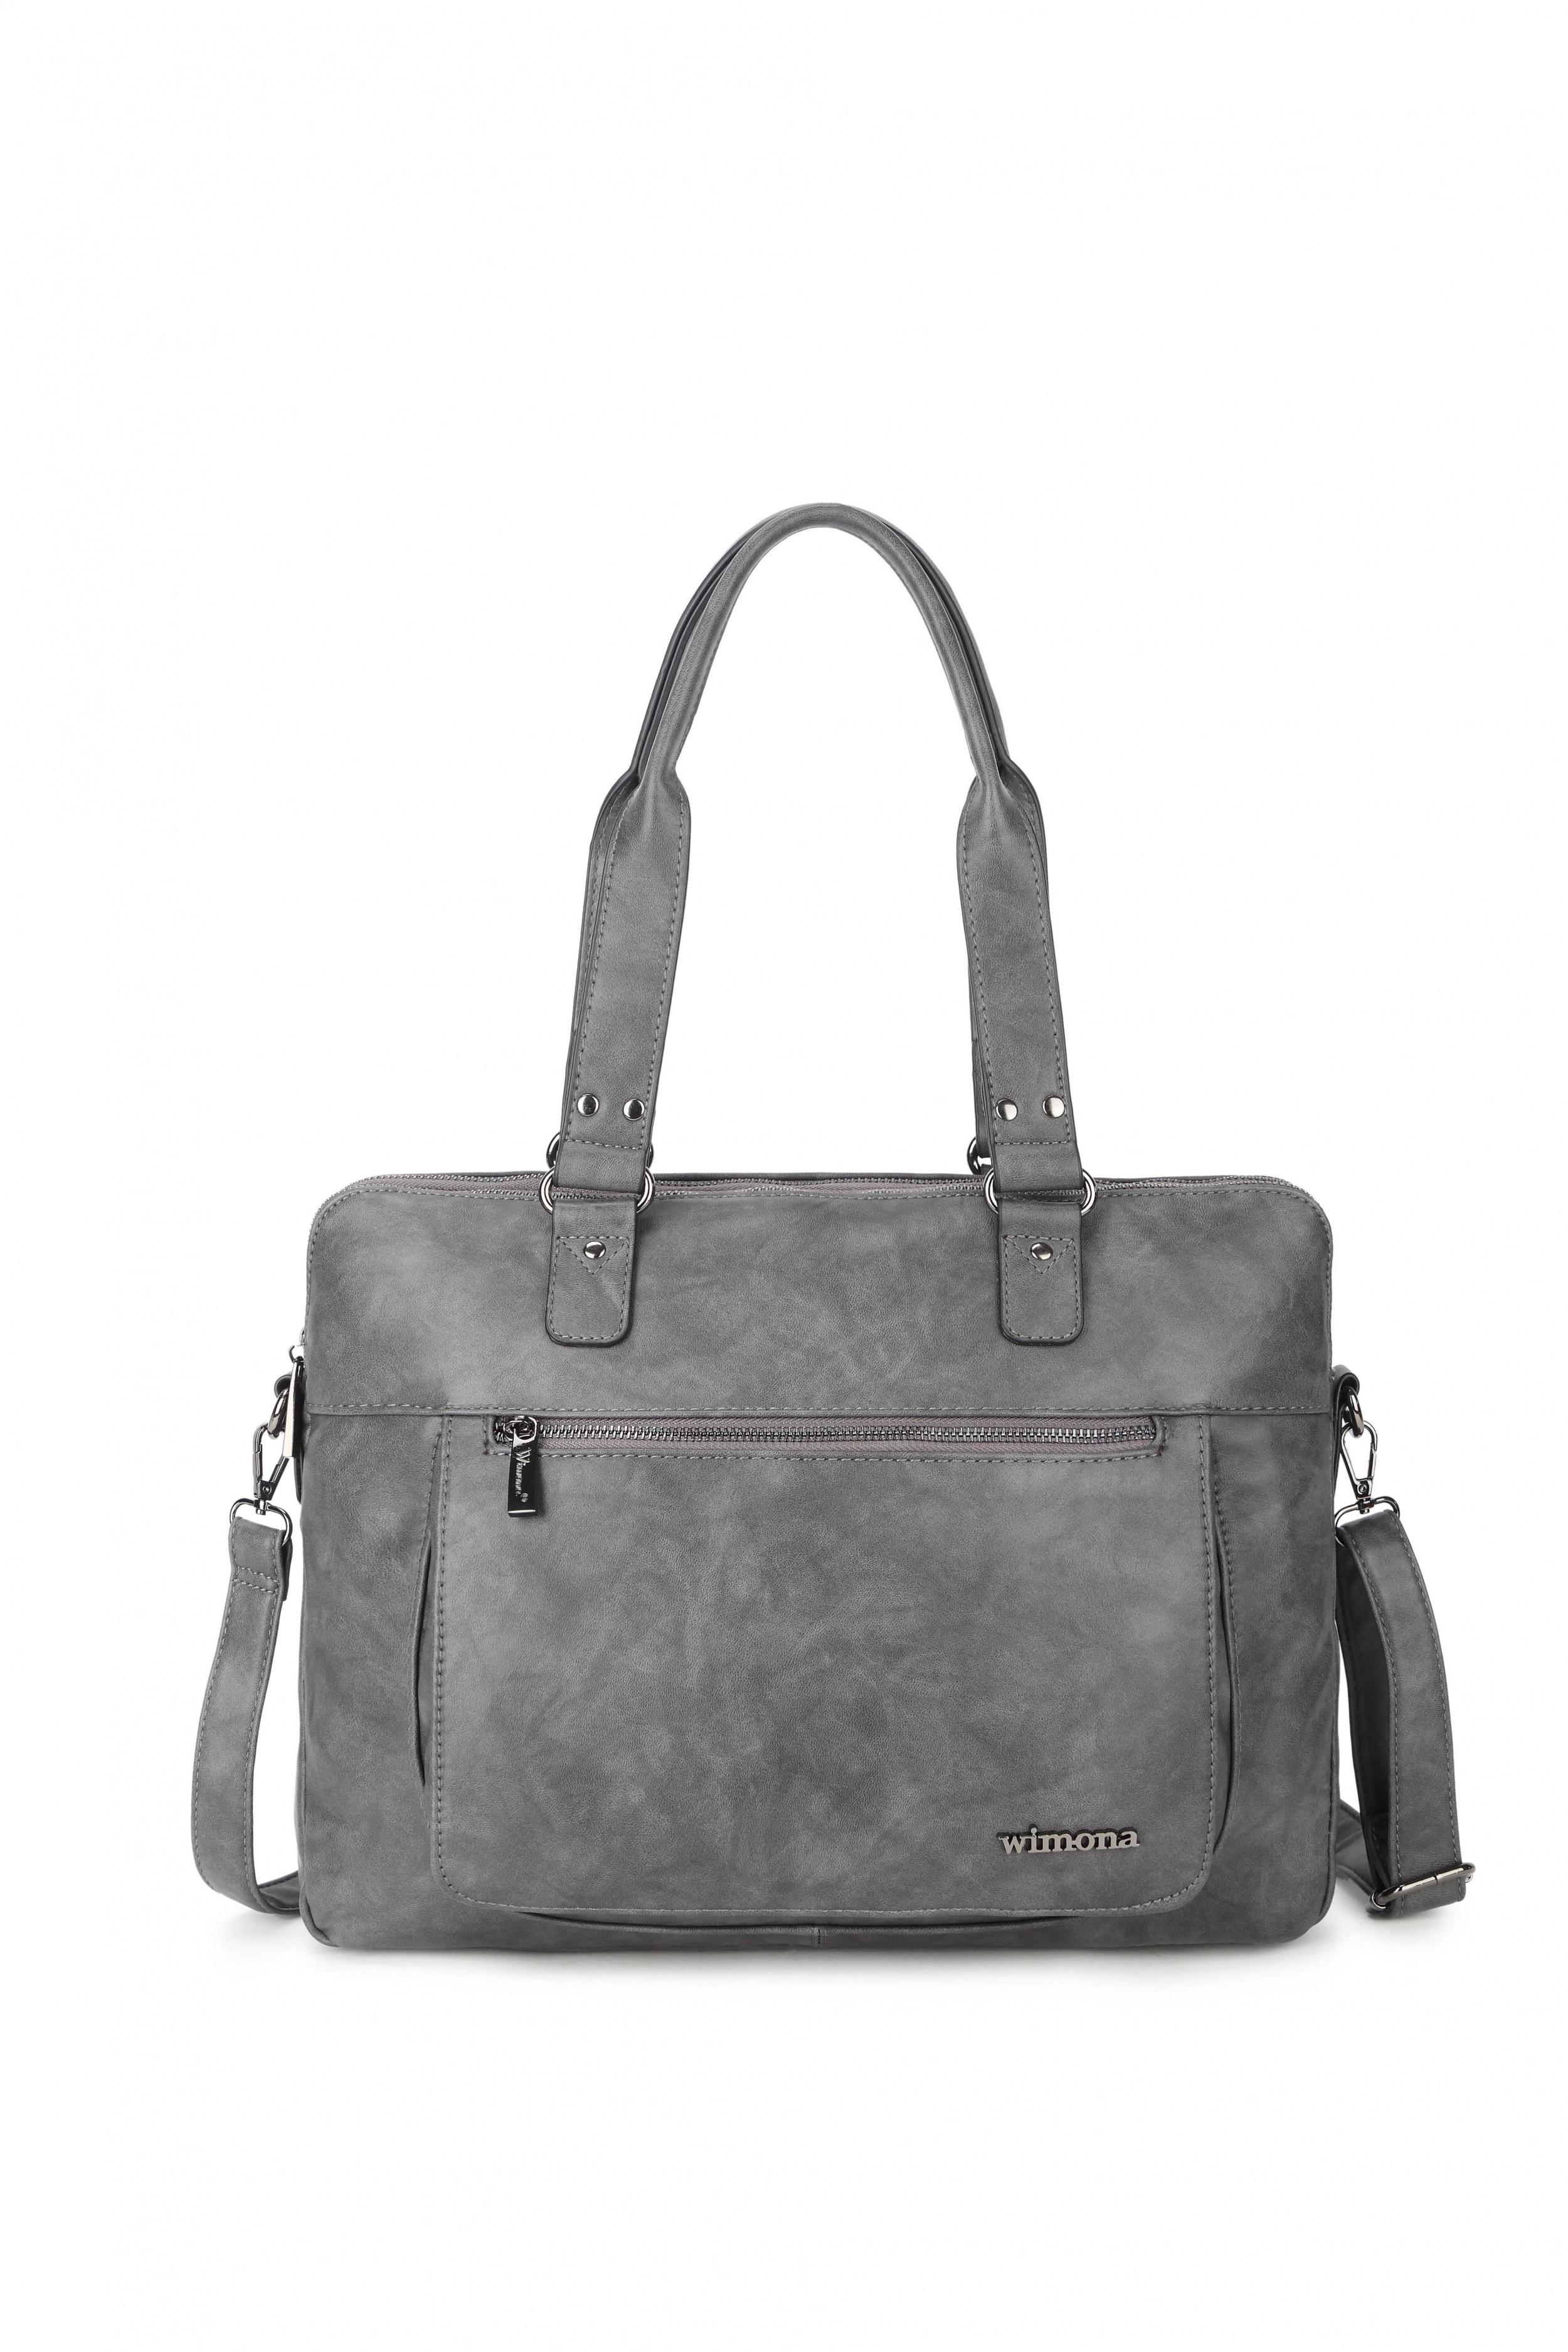 Wimona Bags Verona Laptoptas 2099 Grijs